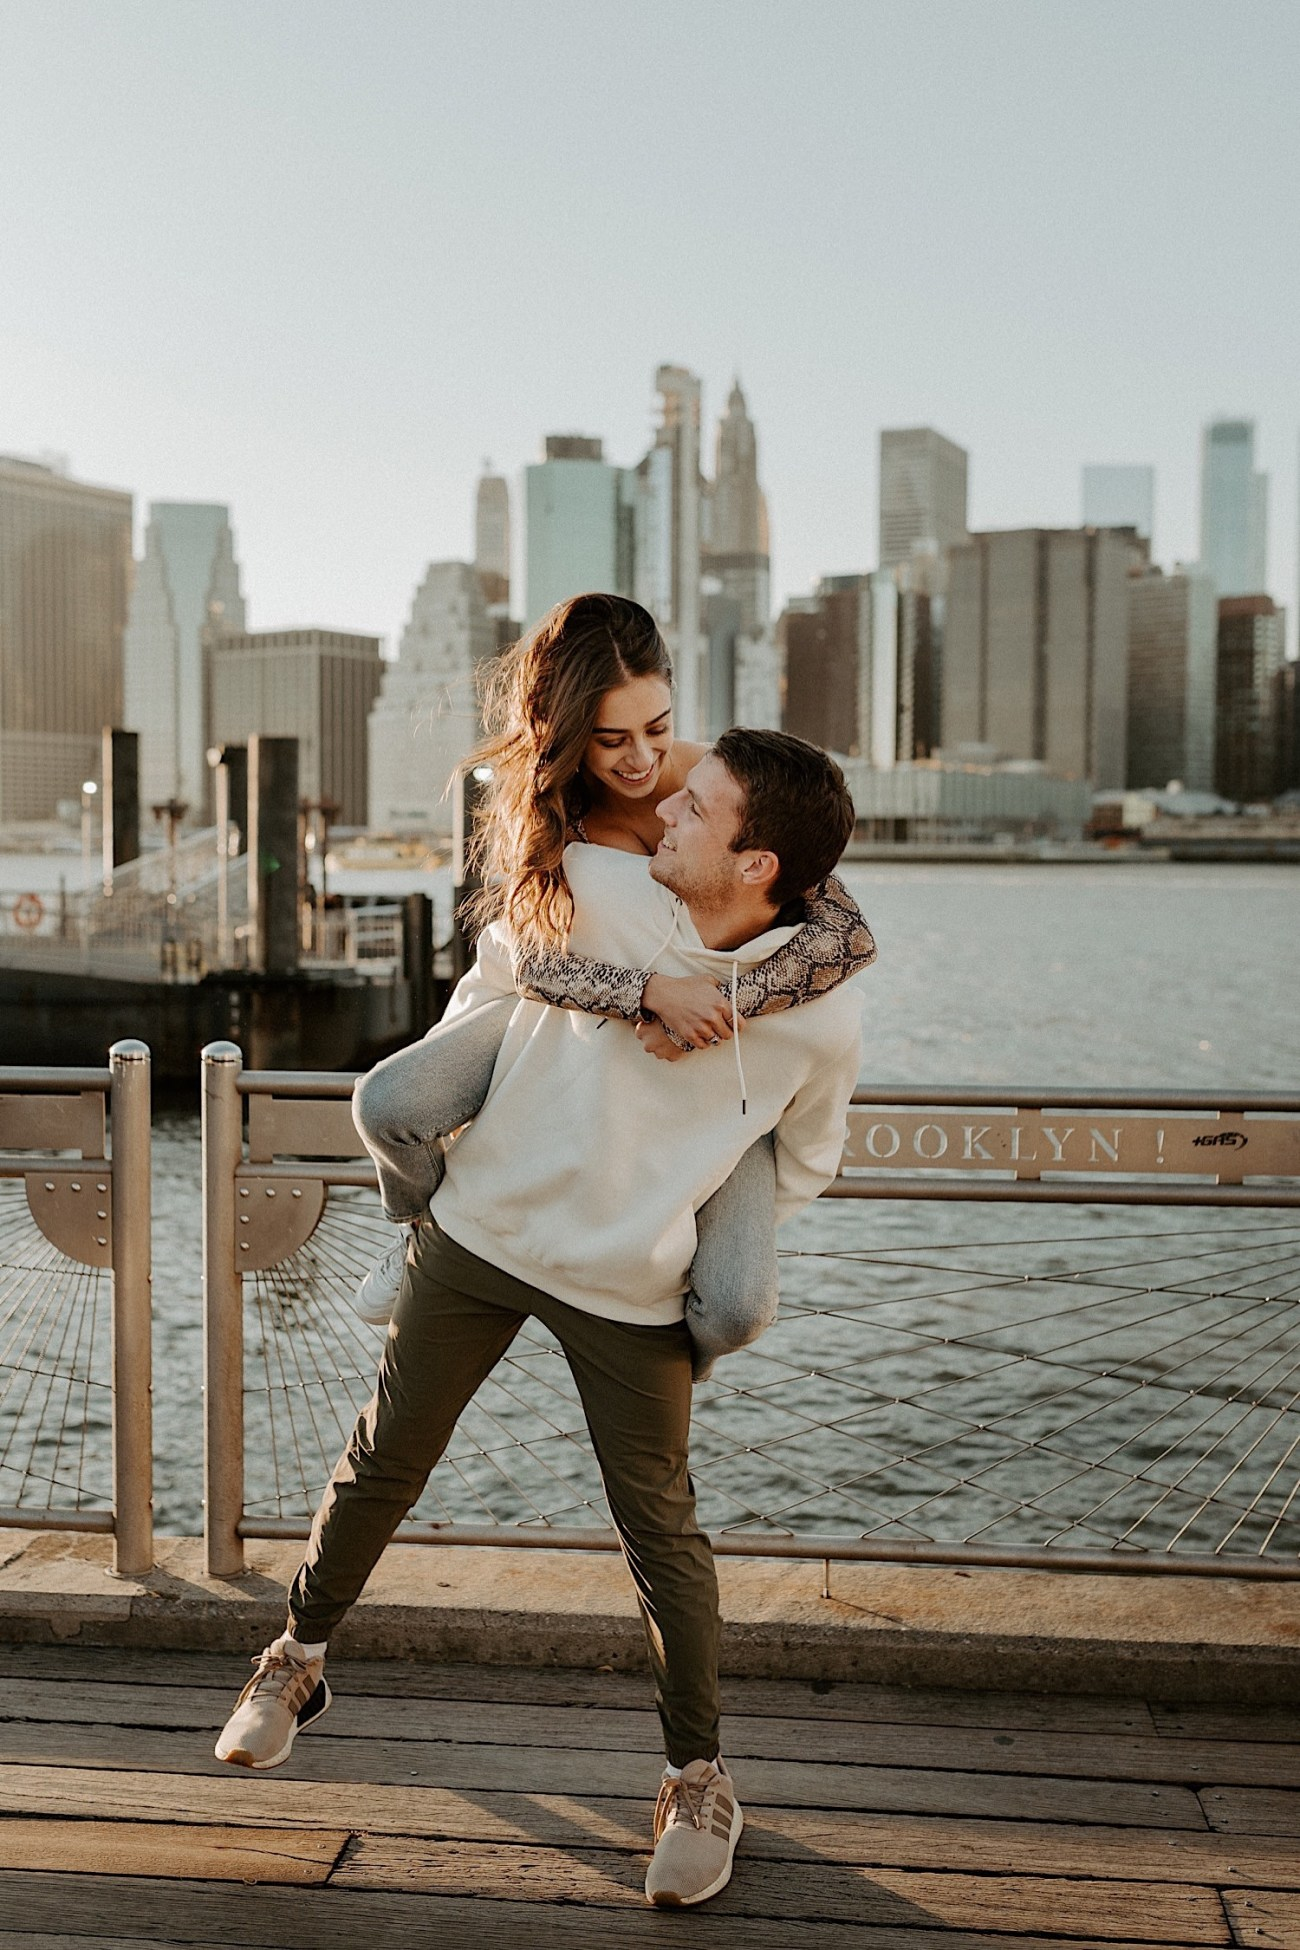 Brooklyn Bridge Sunset Engagement Photos New York City Wedding Photographer 019